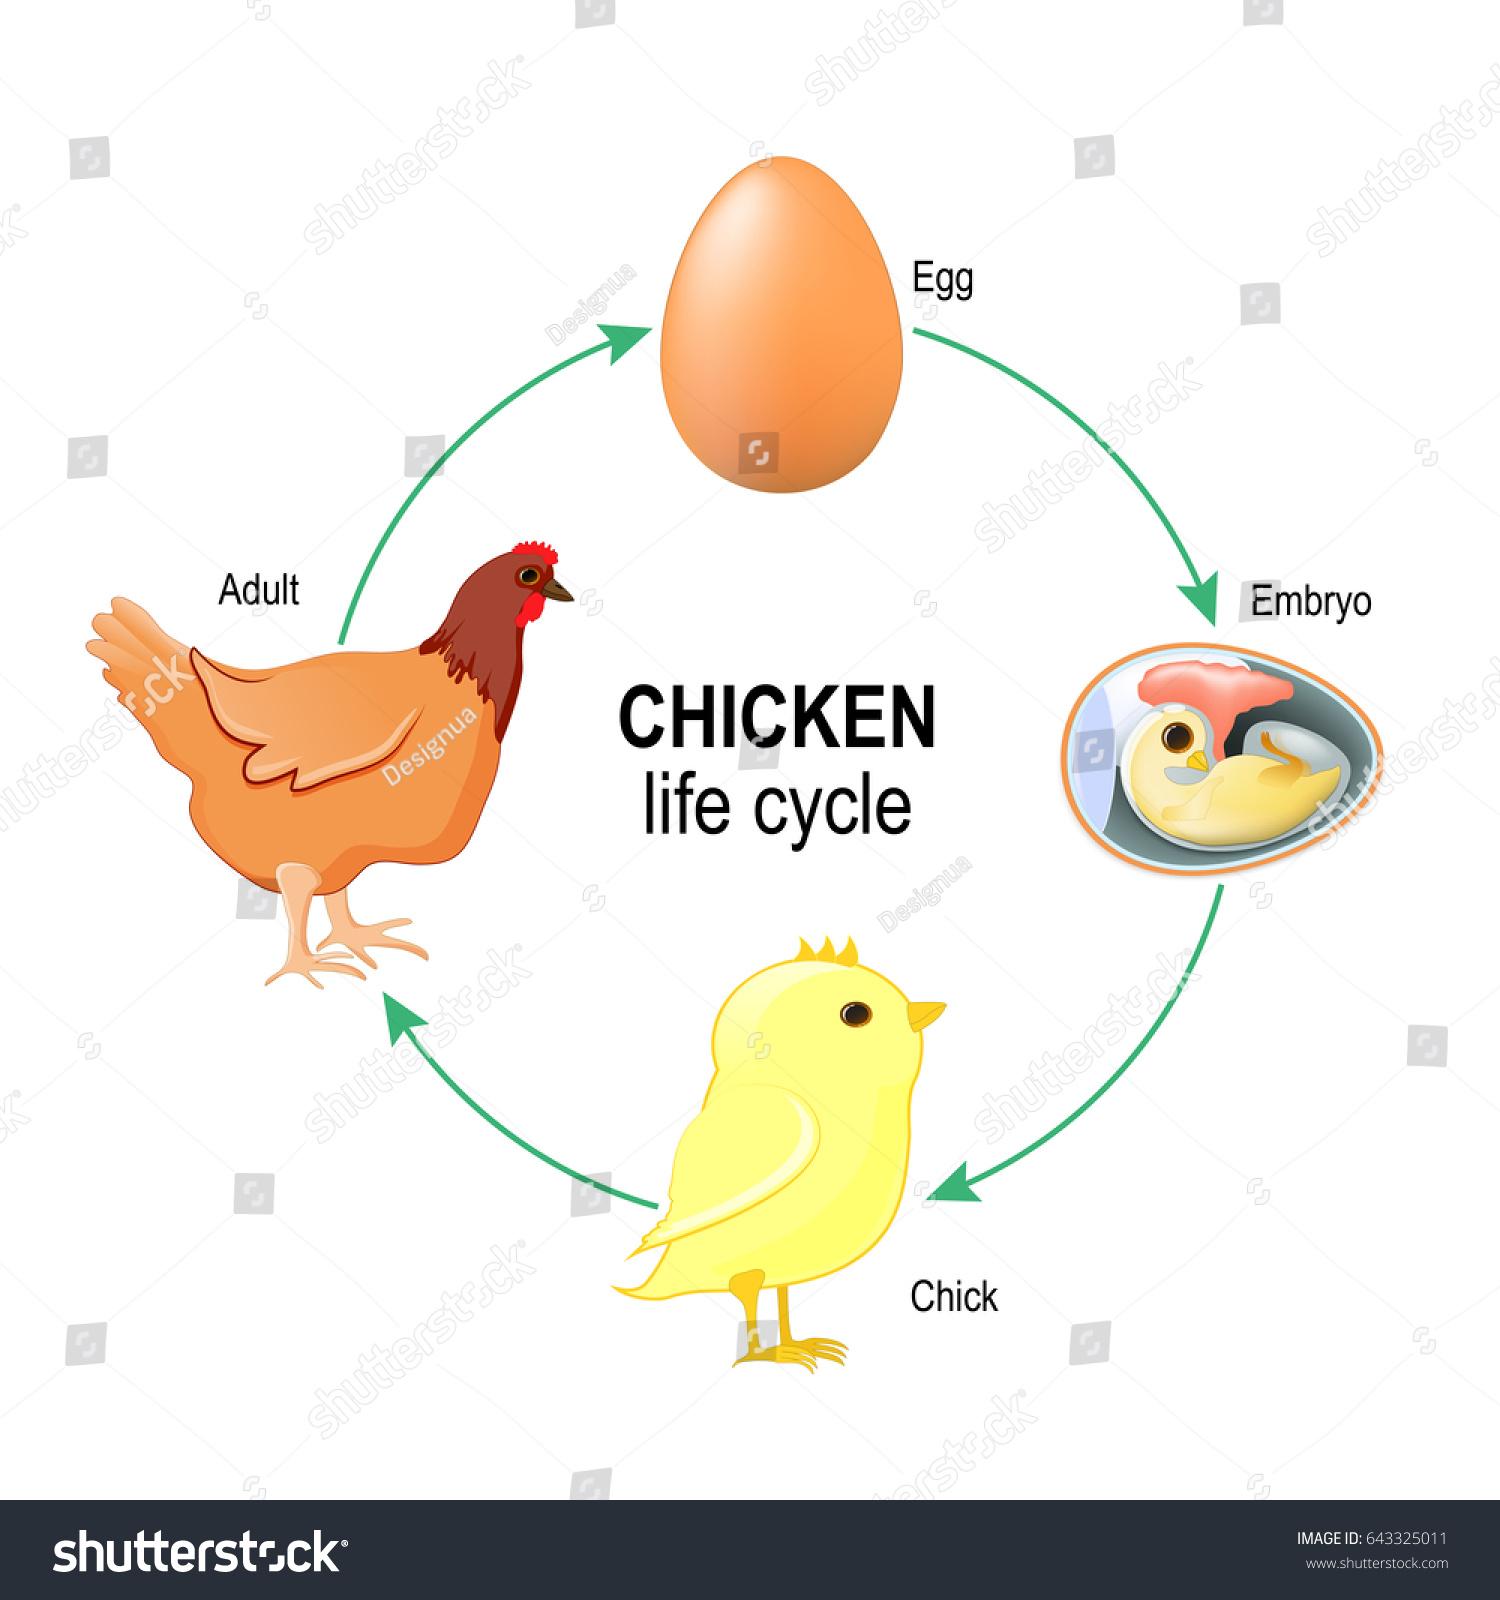 Anatomy of a chicken egg